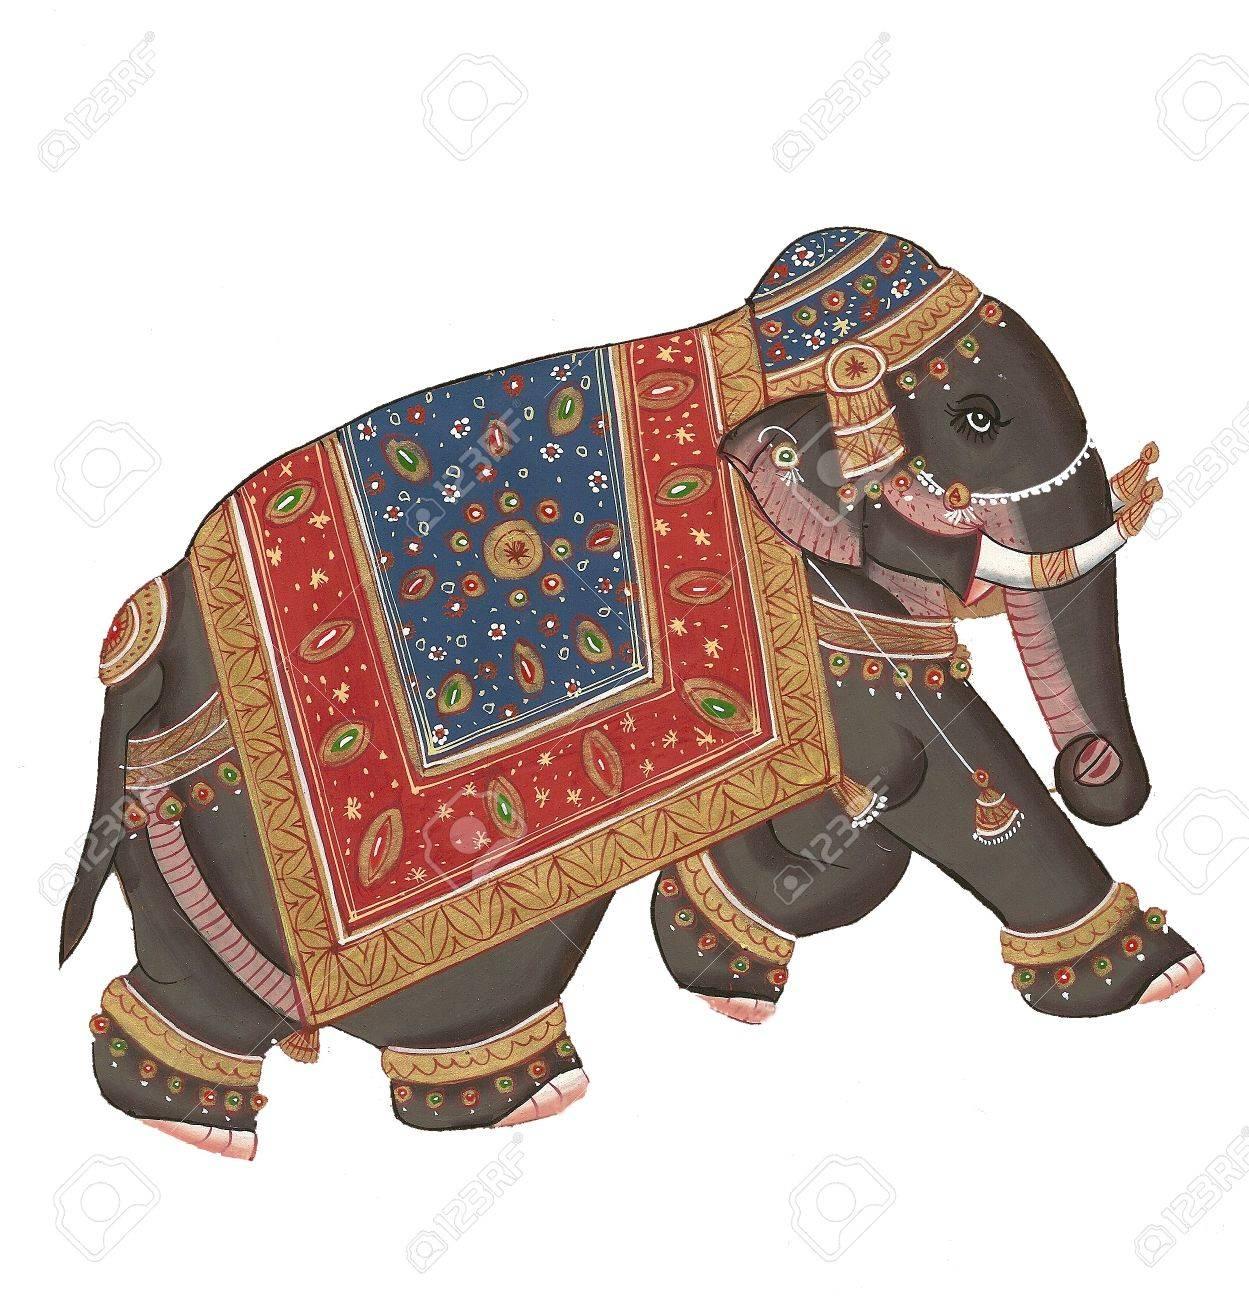 Caparisoned elephants on parade.Indian miniature painting on 19th century paper. Udaipur, India - 9747631